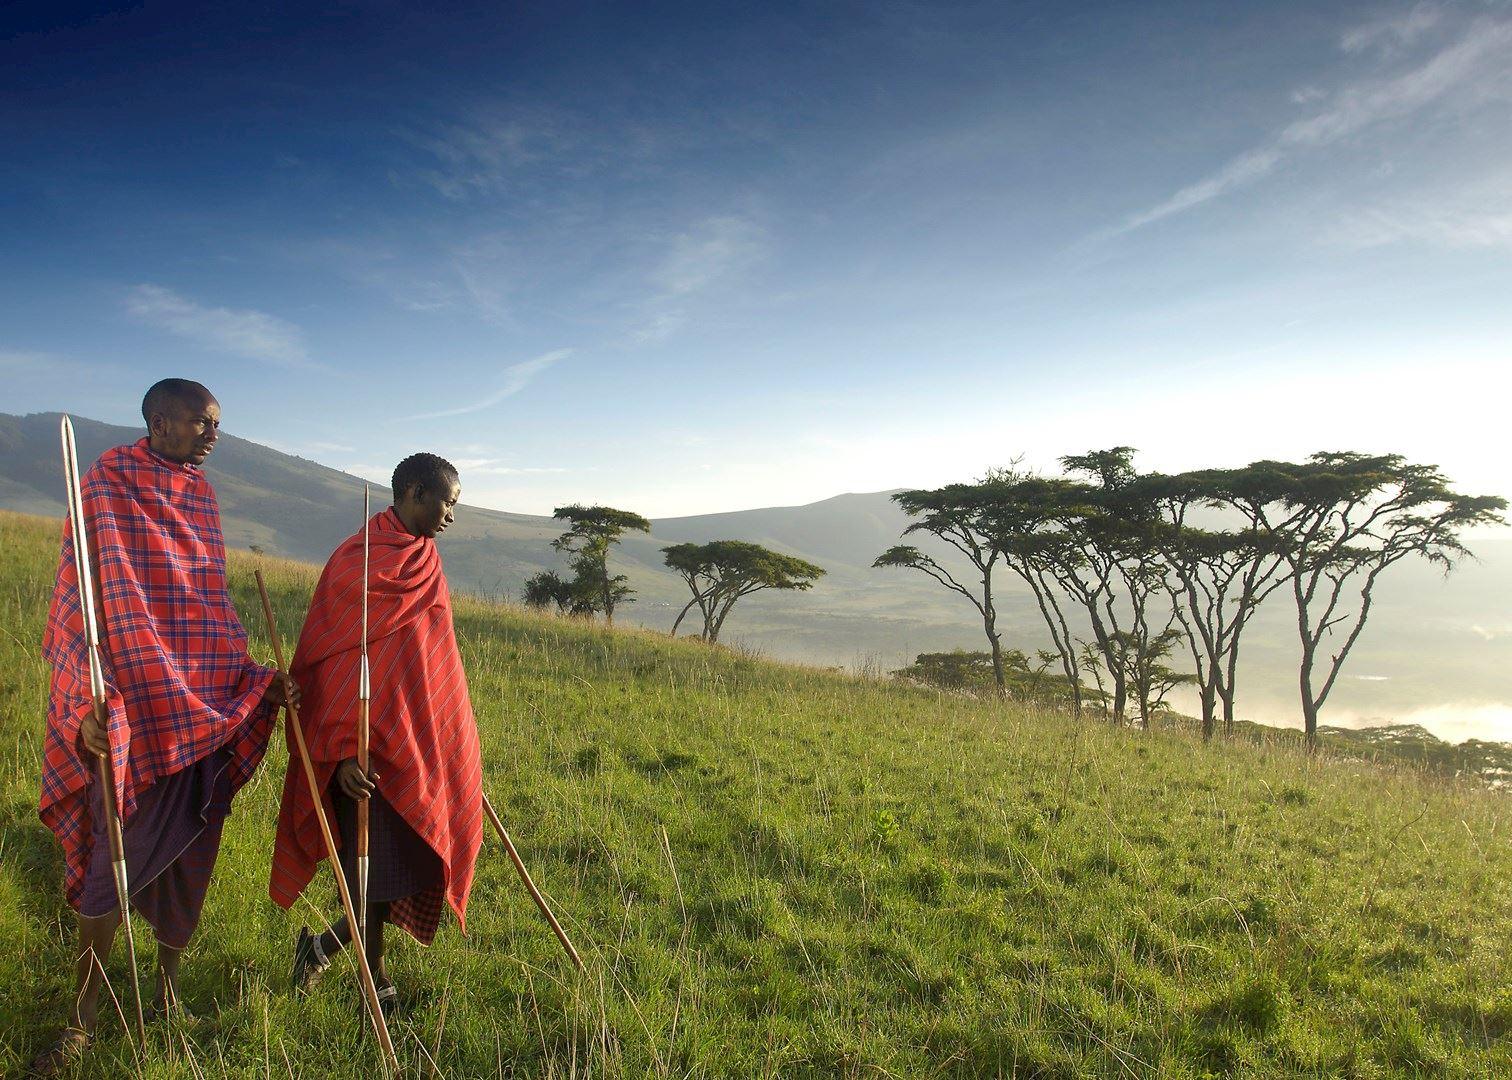 Maasai People, Tribe, Culture, Women, Warriors, Language, Religion